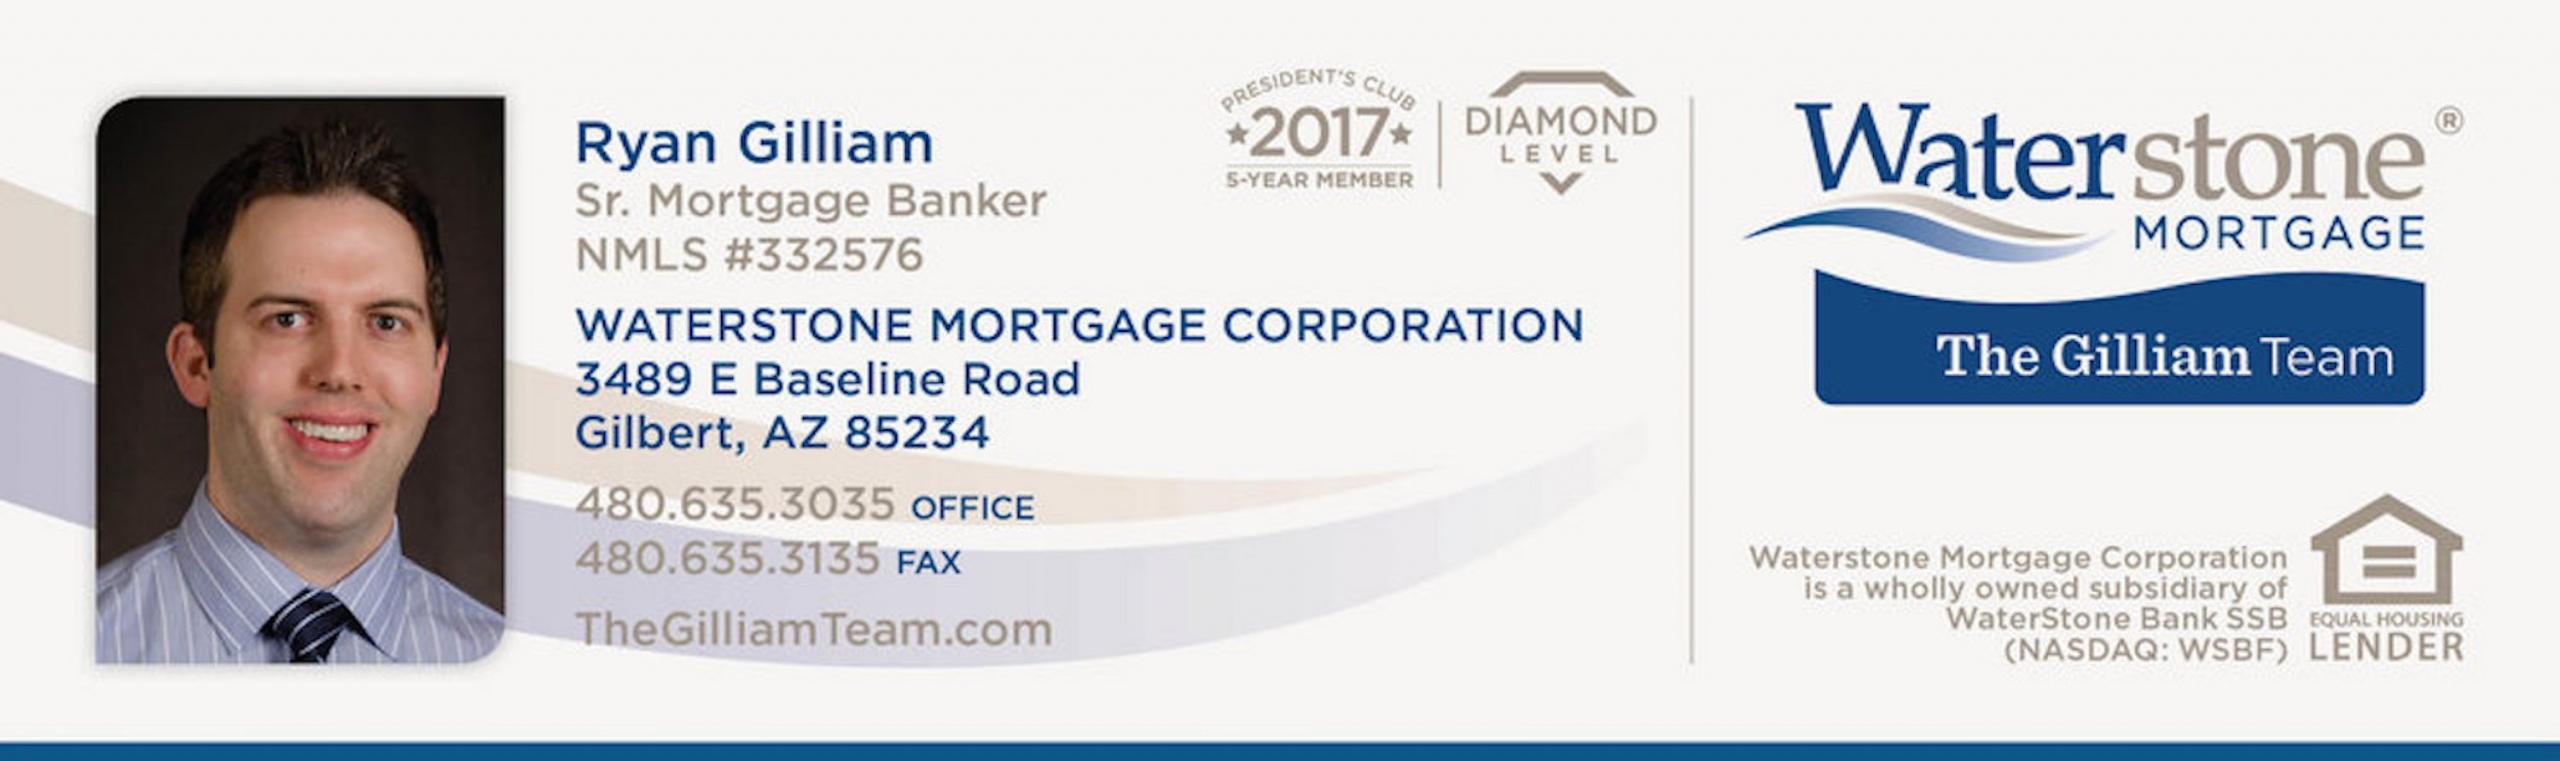 Ryan Gilliam Waterstone Mortgage